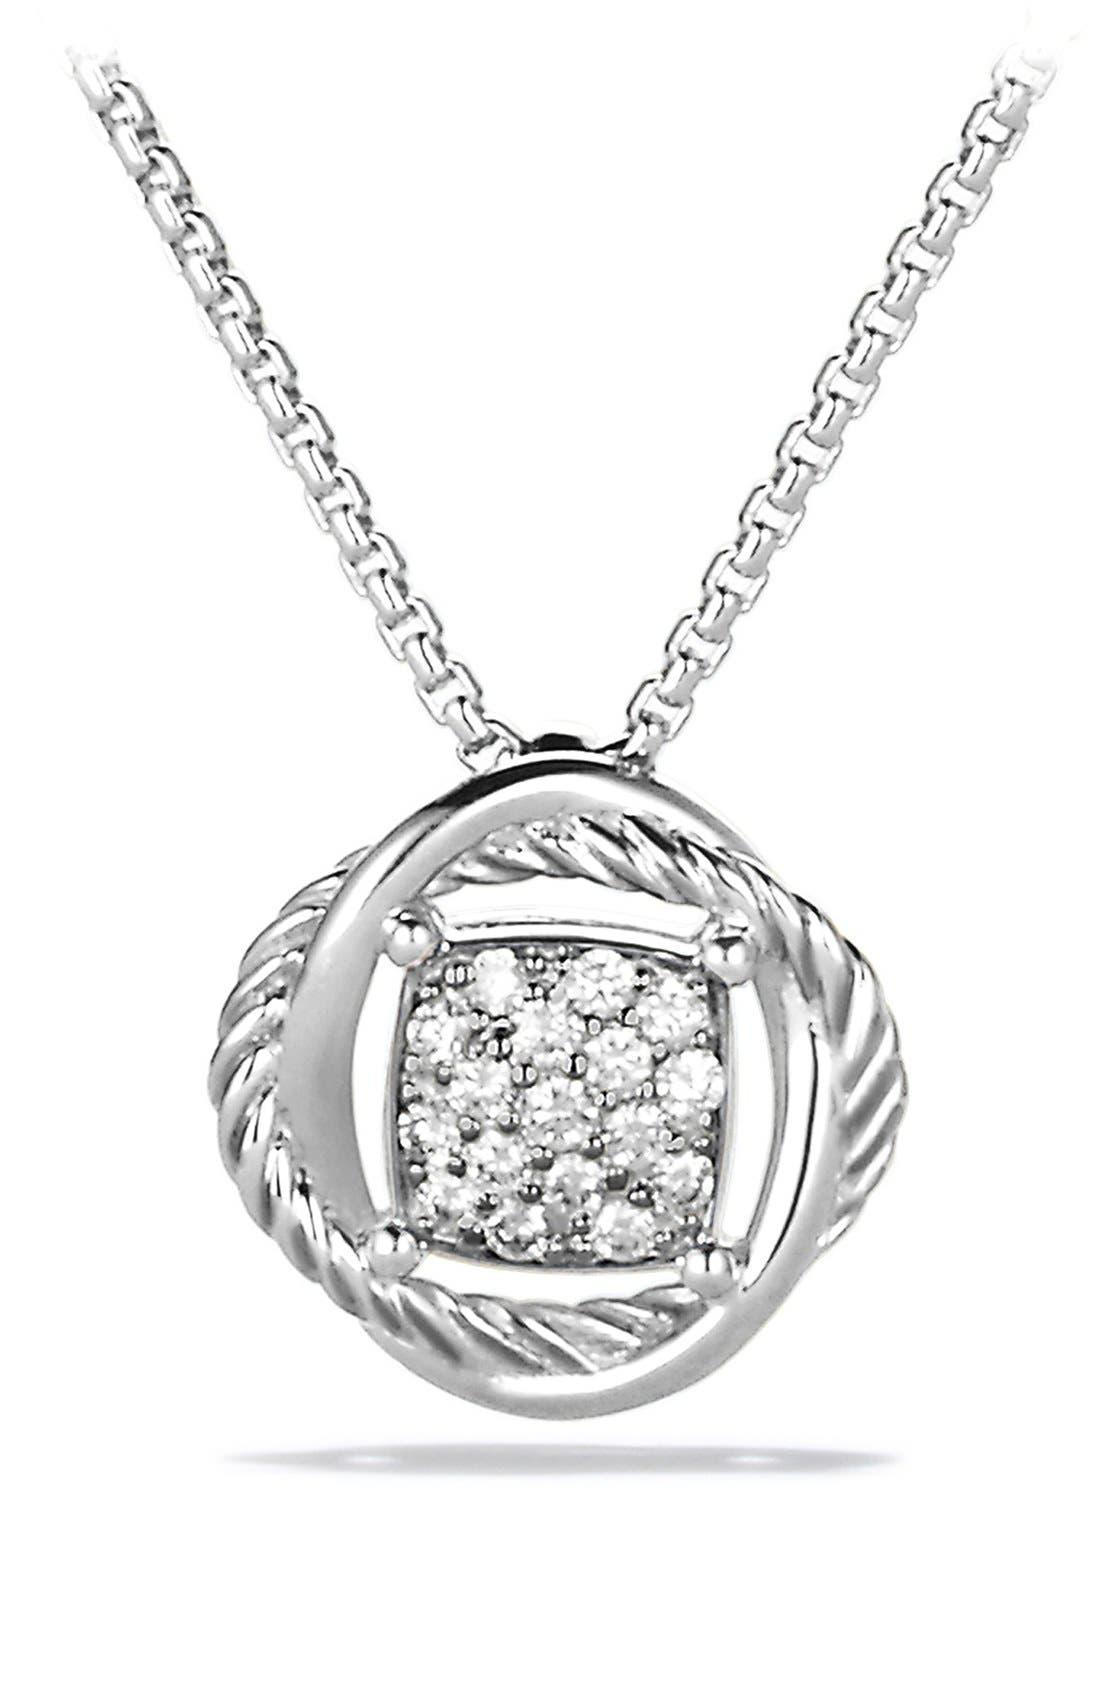 Alternate Image 1 Selected - David Yurman 'Infinity' Pendant with Diamonds on Chain